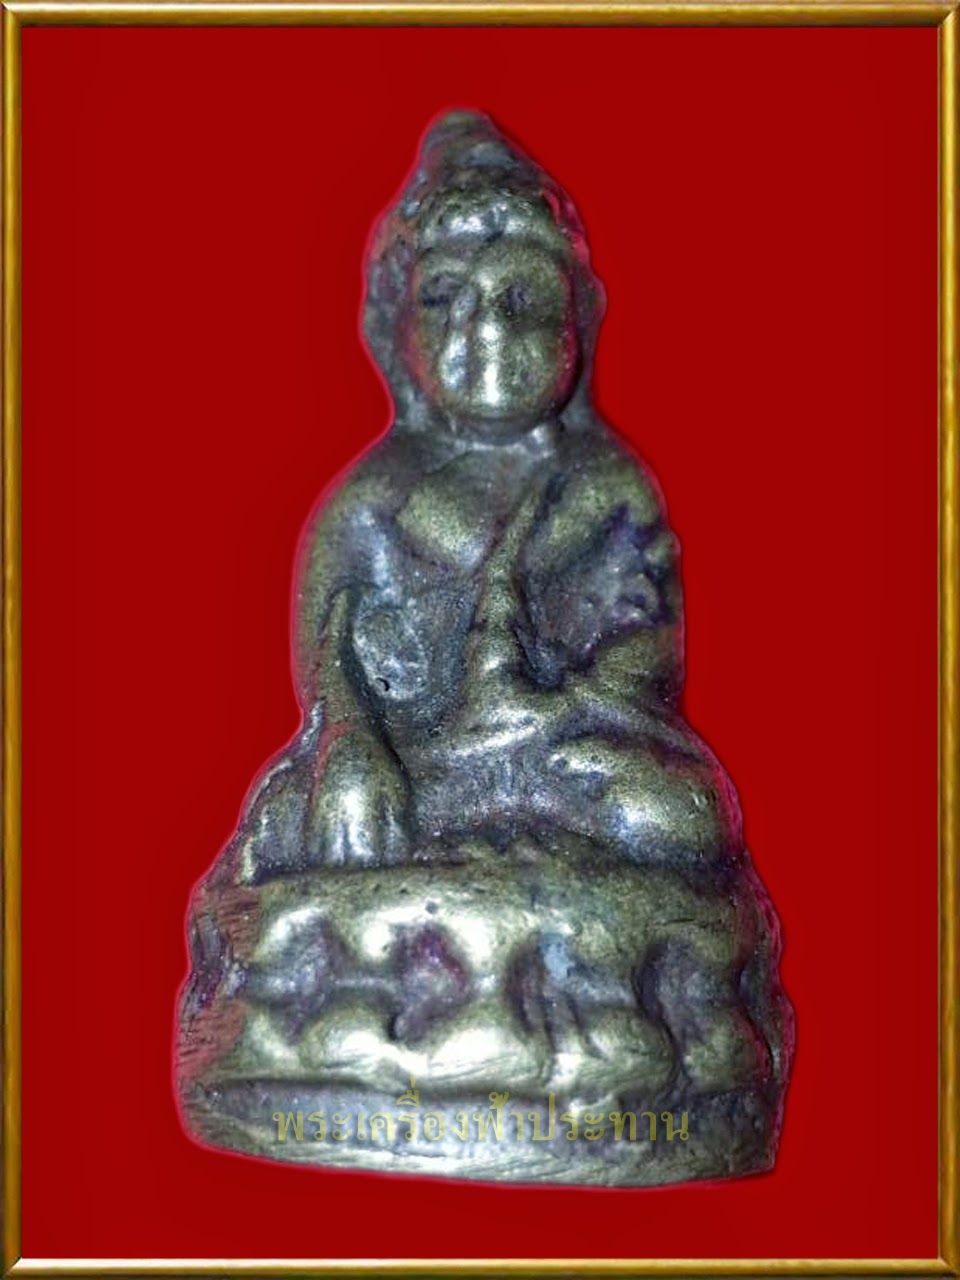 http://tubtimthong-amulet.blogspot.com/2014/12/blog-post_90.html